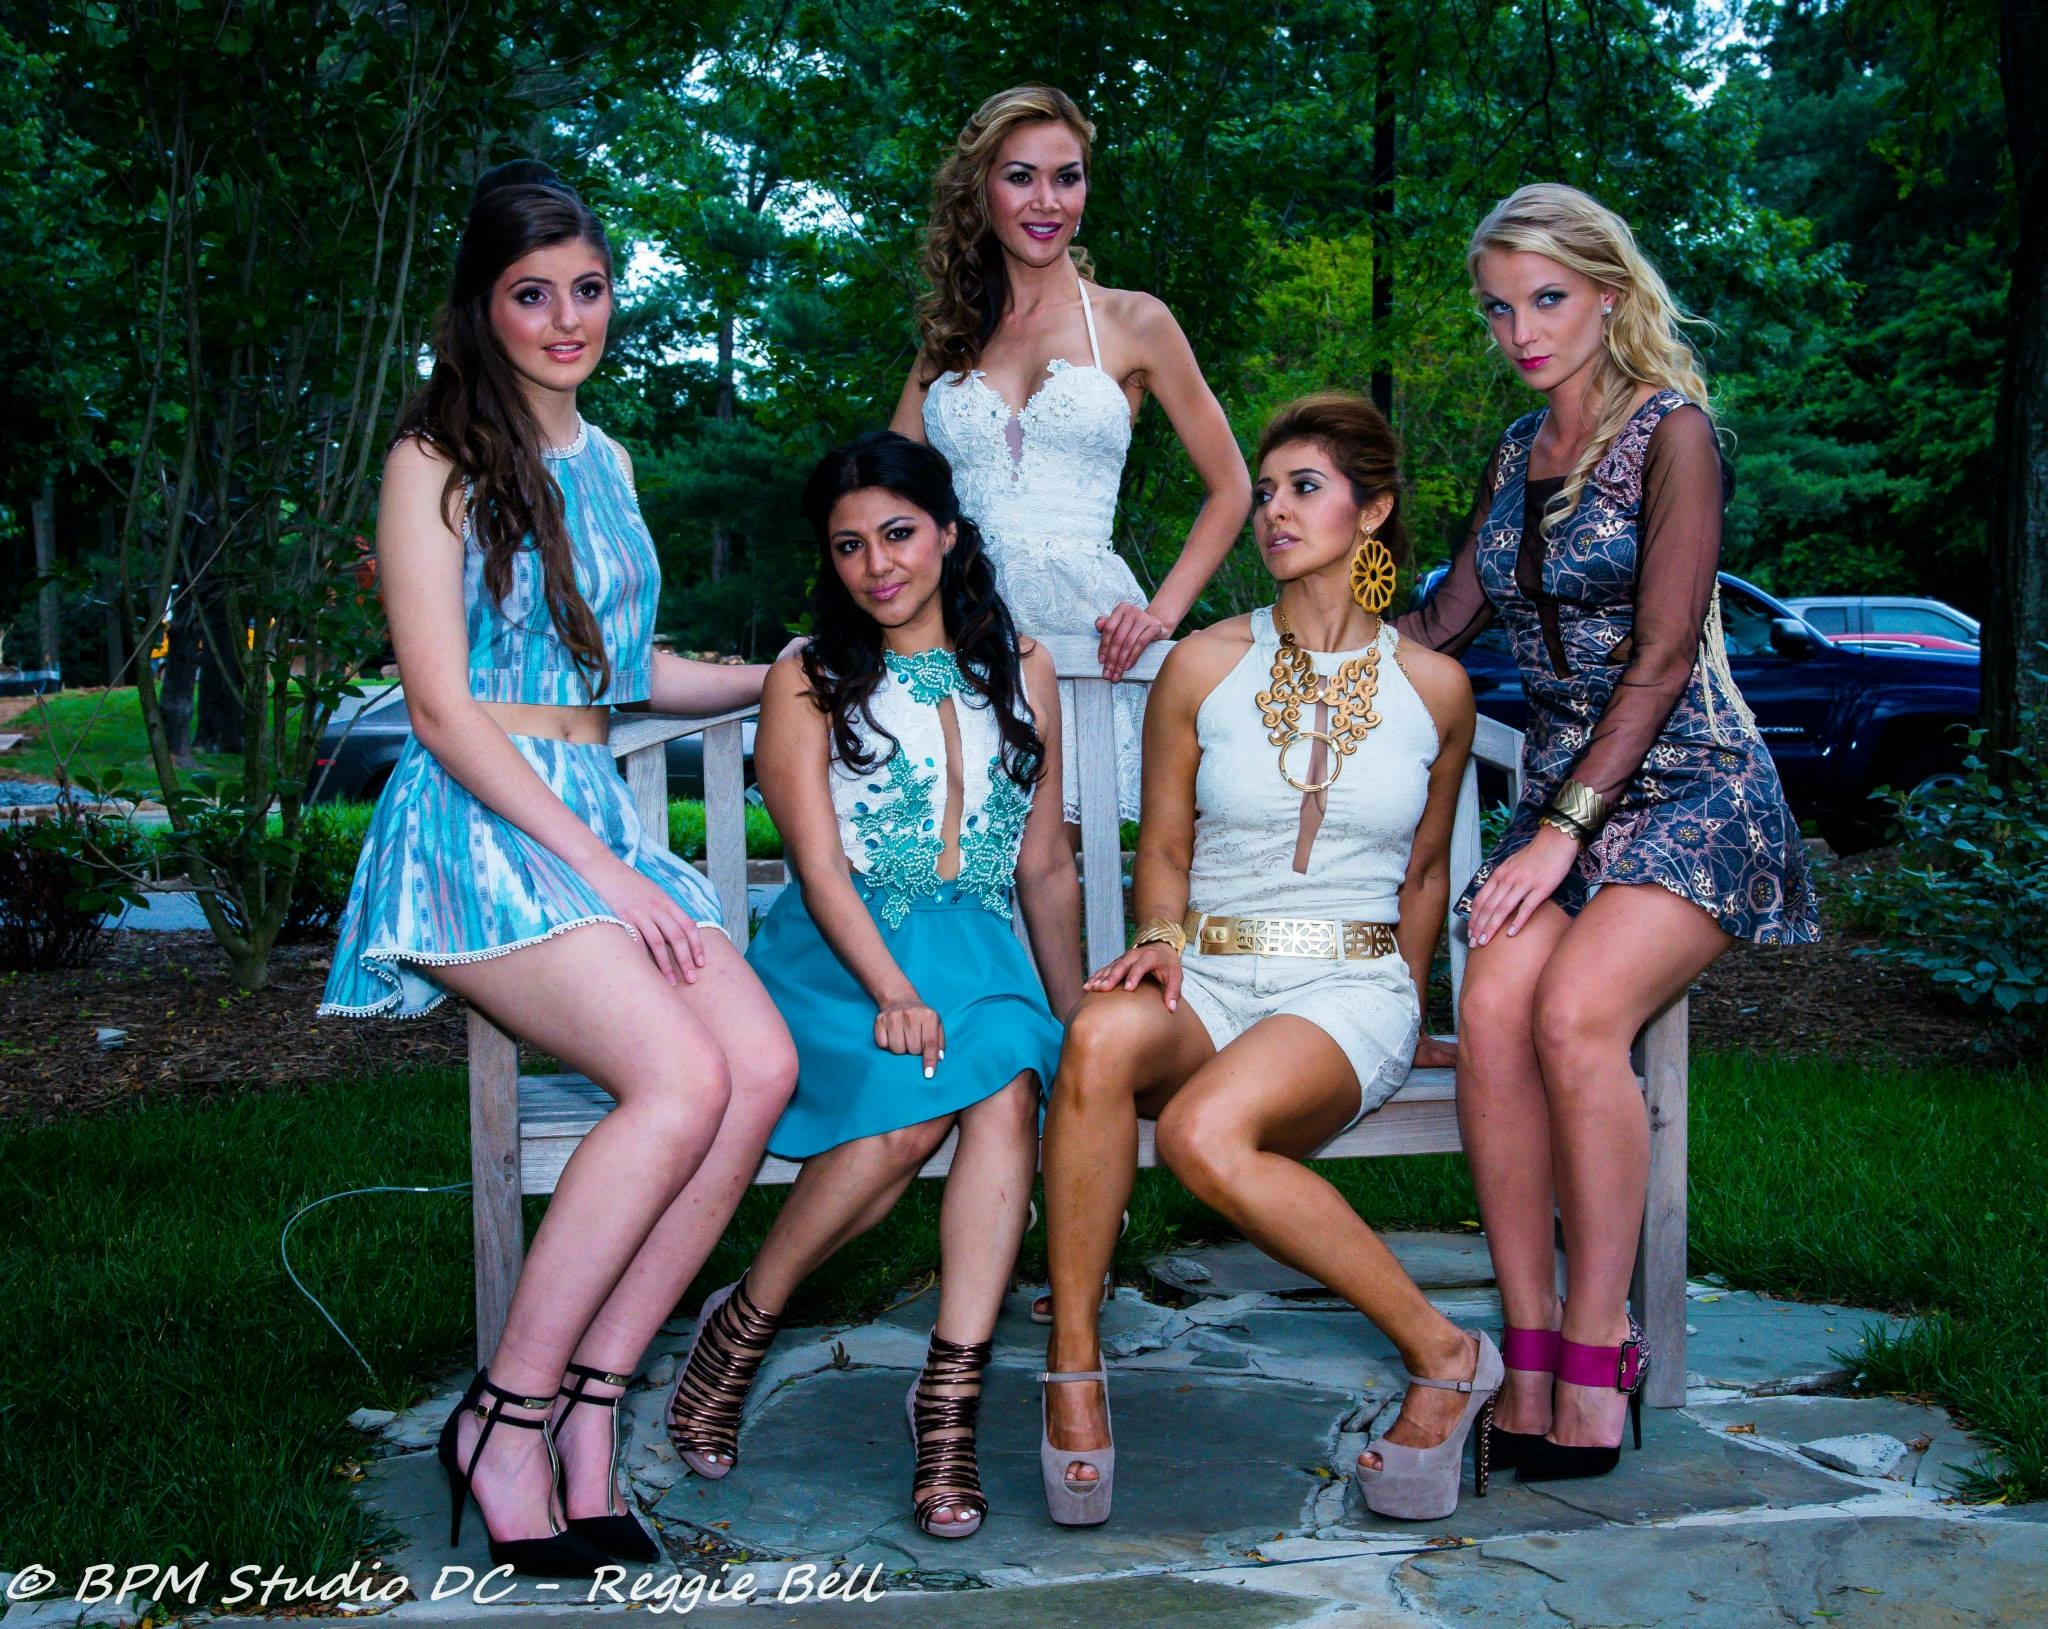 Savvy_Sexy_socia_womens_Networking_club_Keula_Binelly_Happy_hour_fashion_show_Bethesda_Couture_Fashion_Show_Four_Season_Salon_Spa_Toka_Salon_Spa